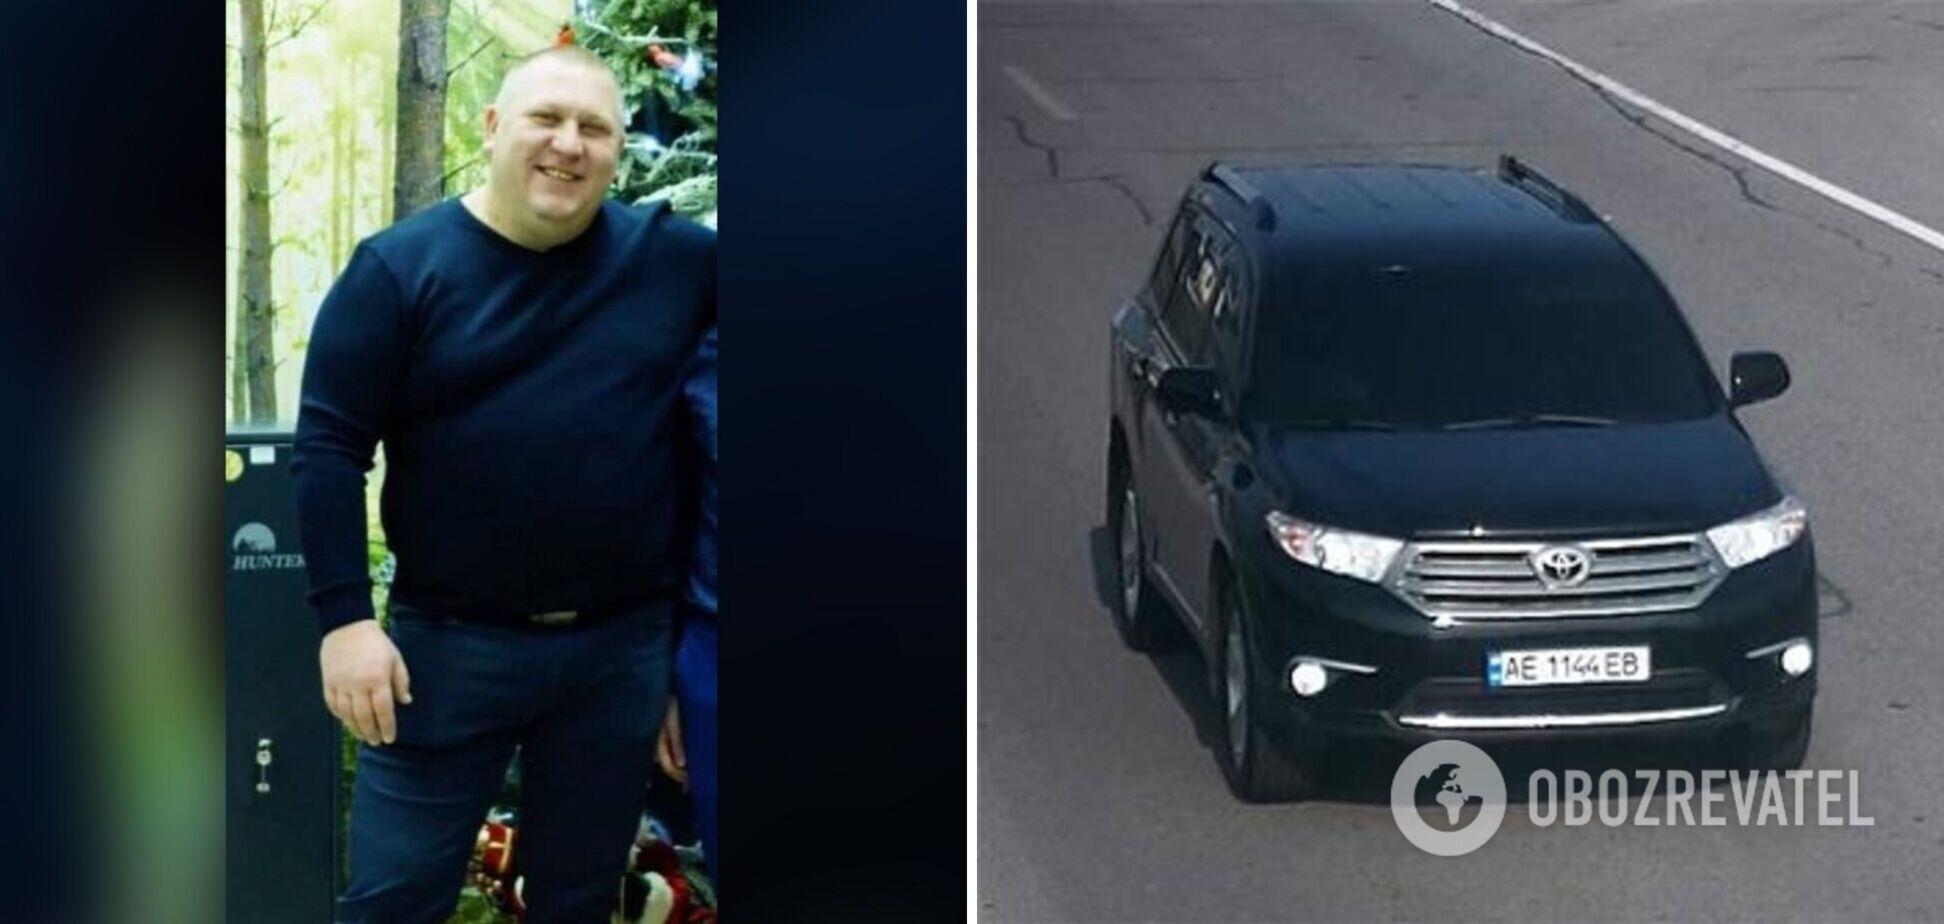 Анатолій Міщенко зник у Дніпрі